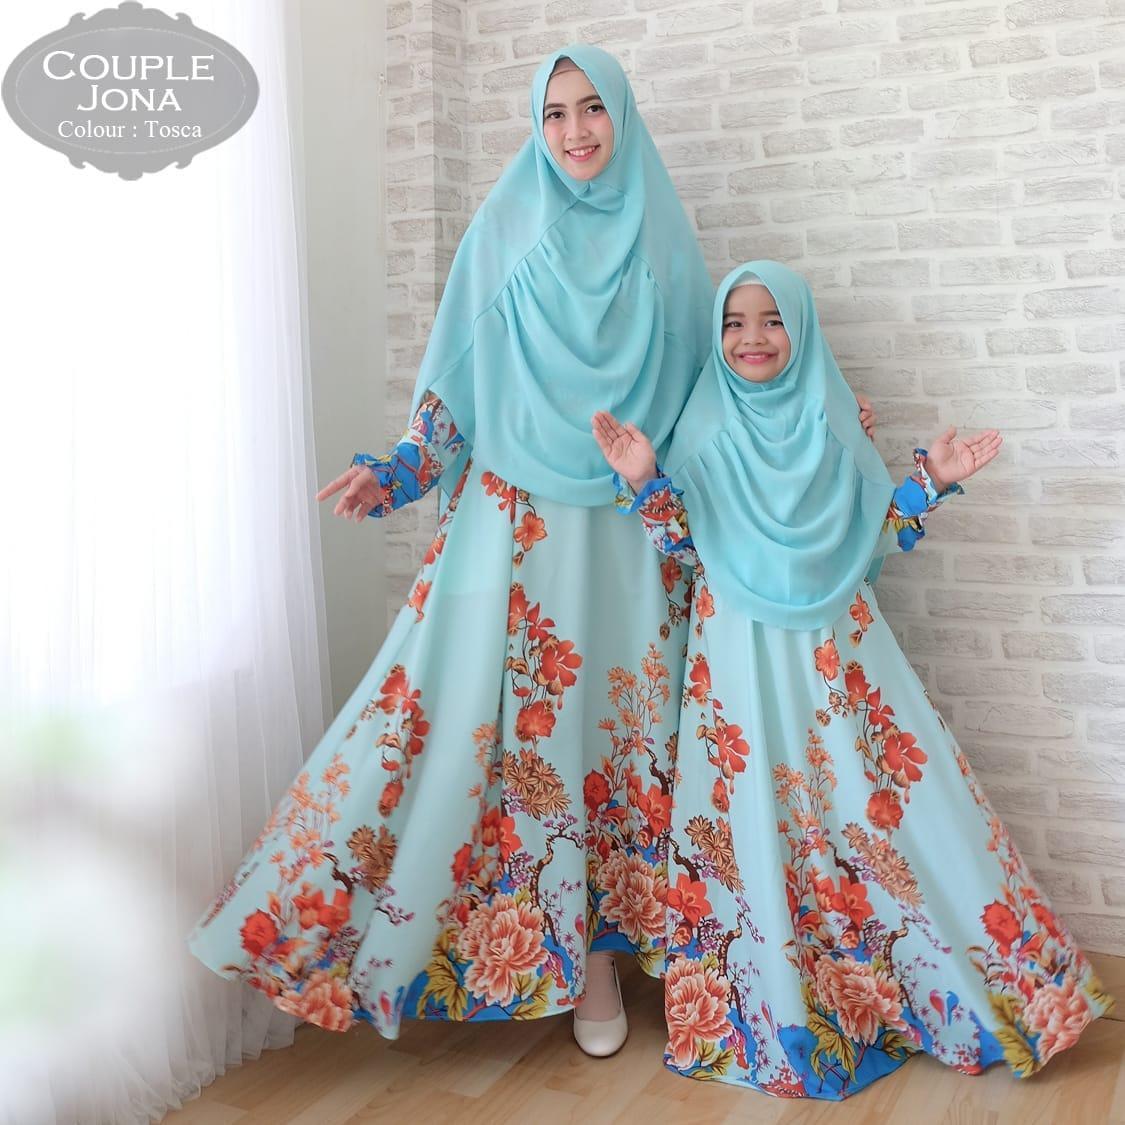 Kiara fashion gamis muslim syari maxmara lux amira ibu dan anak couple baju lebaran terbaru dan terkini fashionable